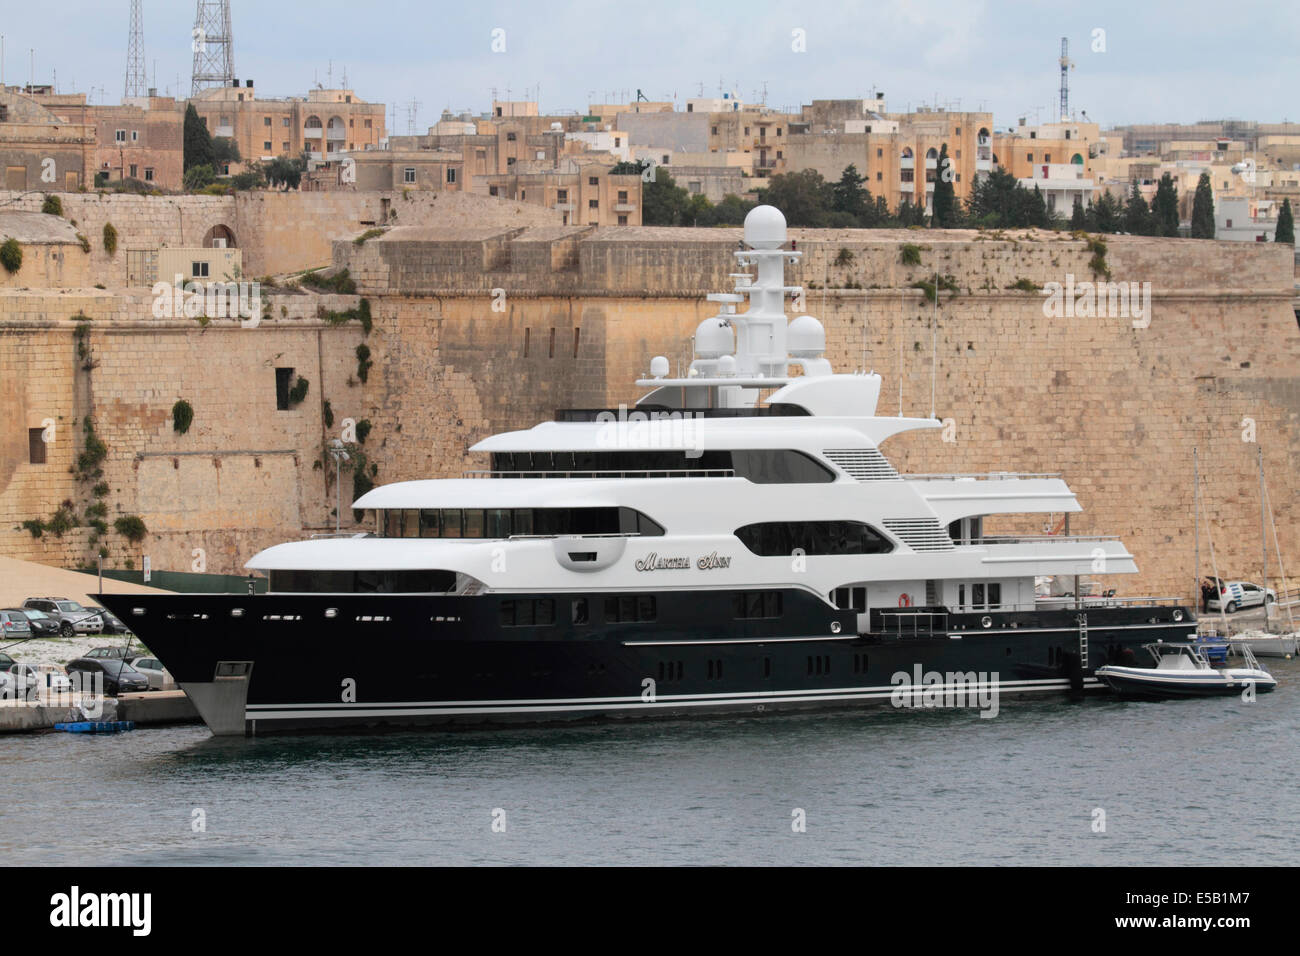 The 70-metre Lurssen superyacht Martha Ann moored beneath Fort St Angelo in Malta - Stock Image